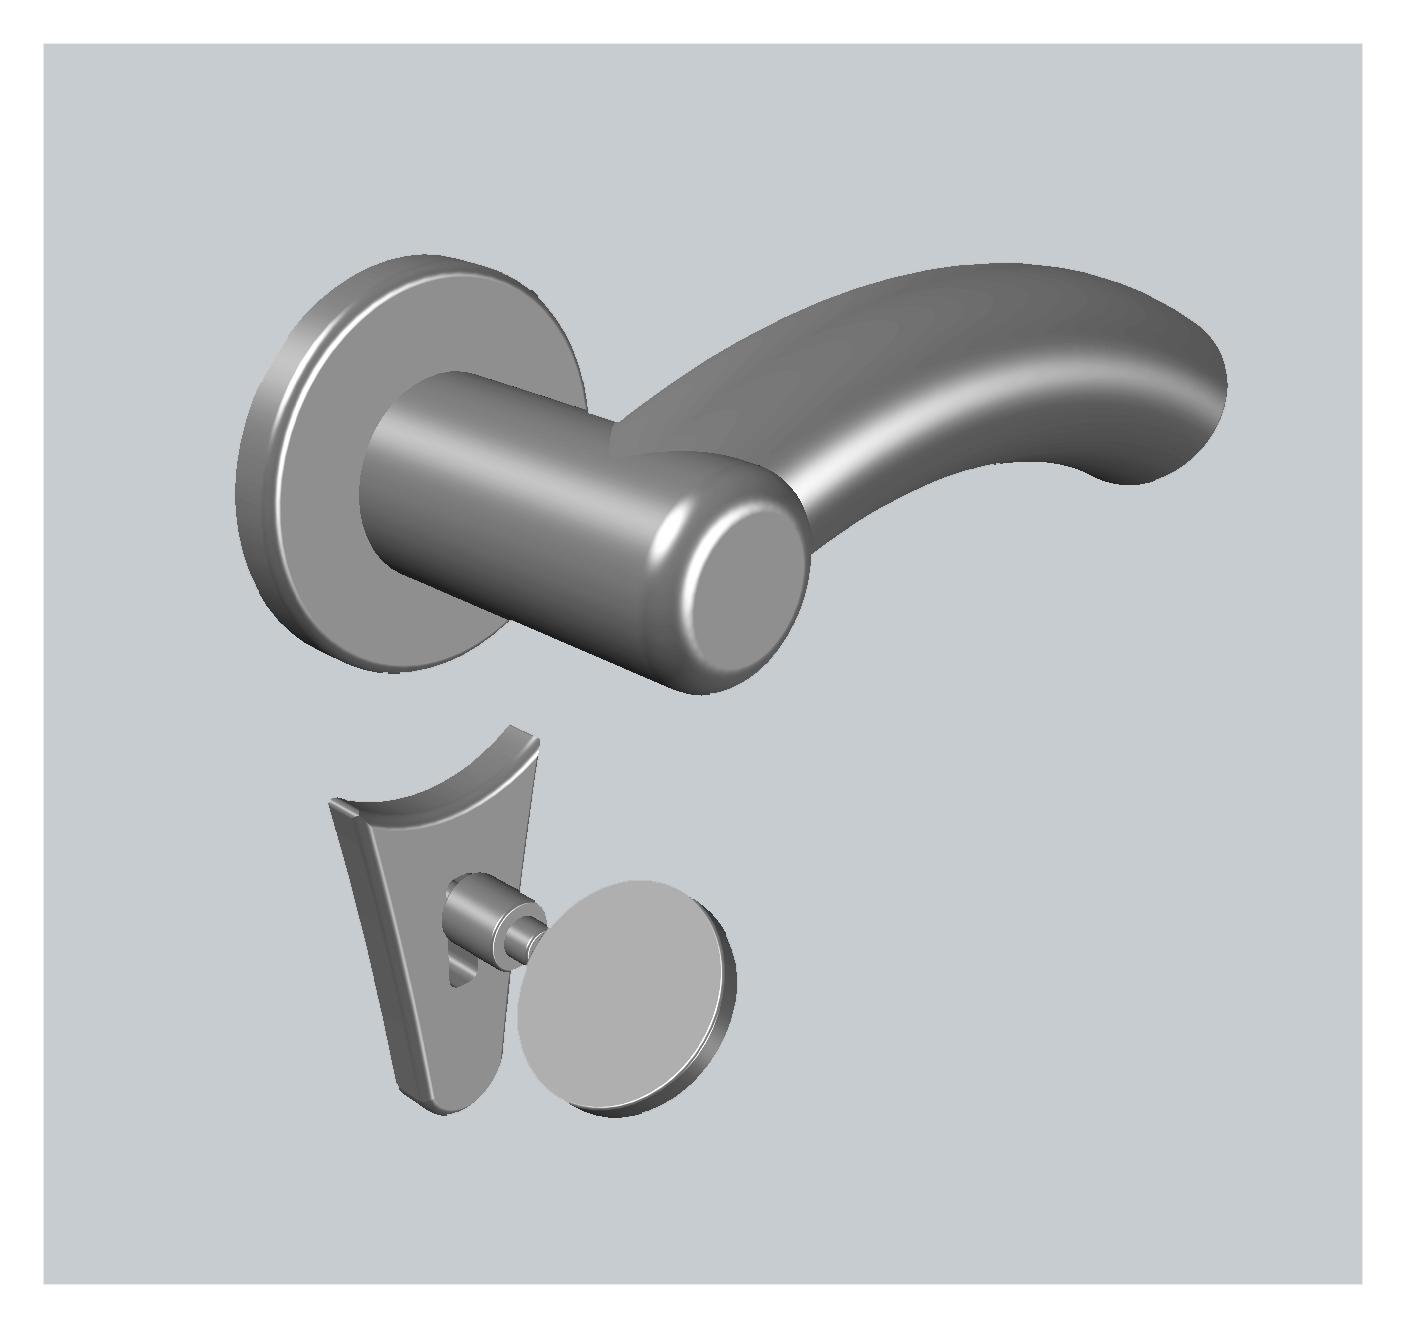 Eyescad ferramenta 3d for Porte 3d dwg